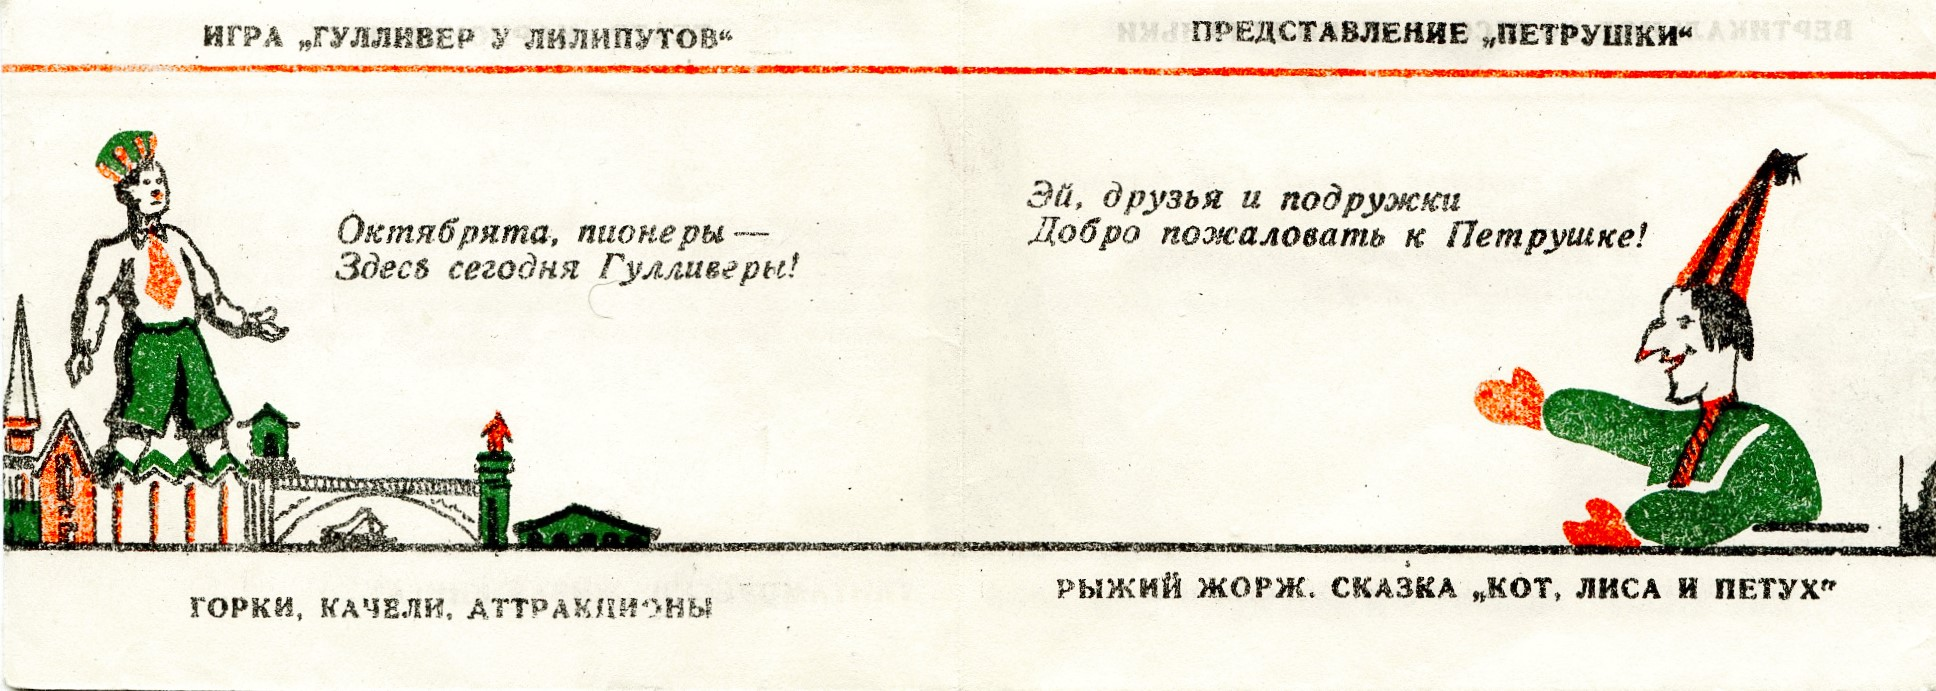 1946 программа004 кор.jpg